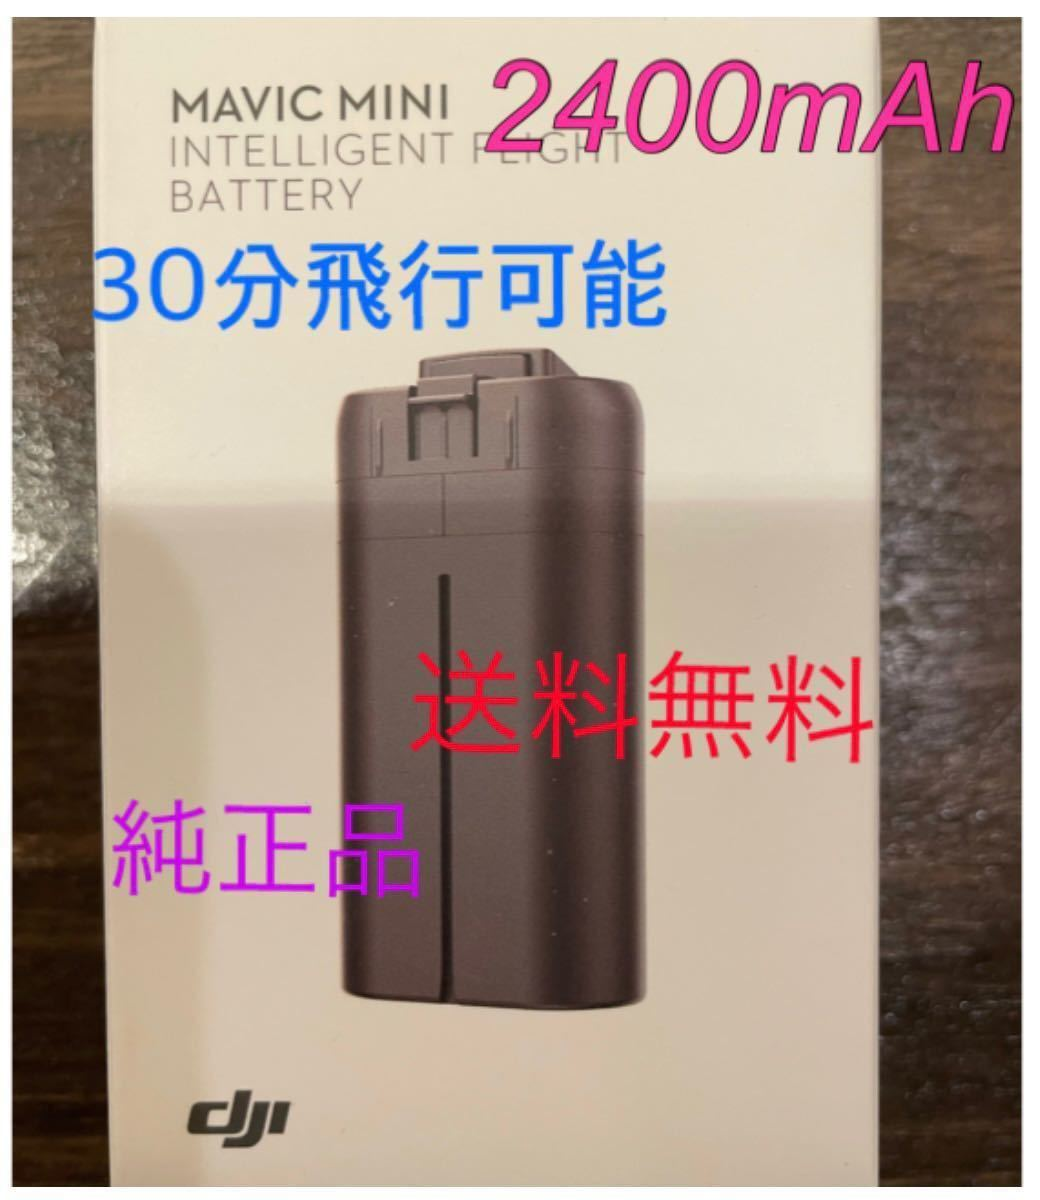 Mavic mini 、DJI mini2 用 2400mAh 海外バッテリー